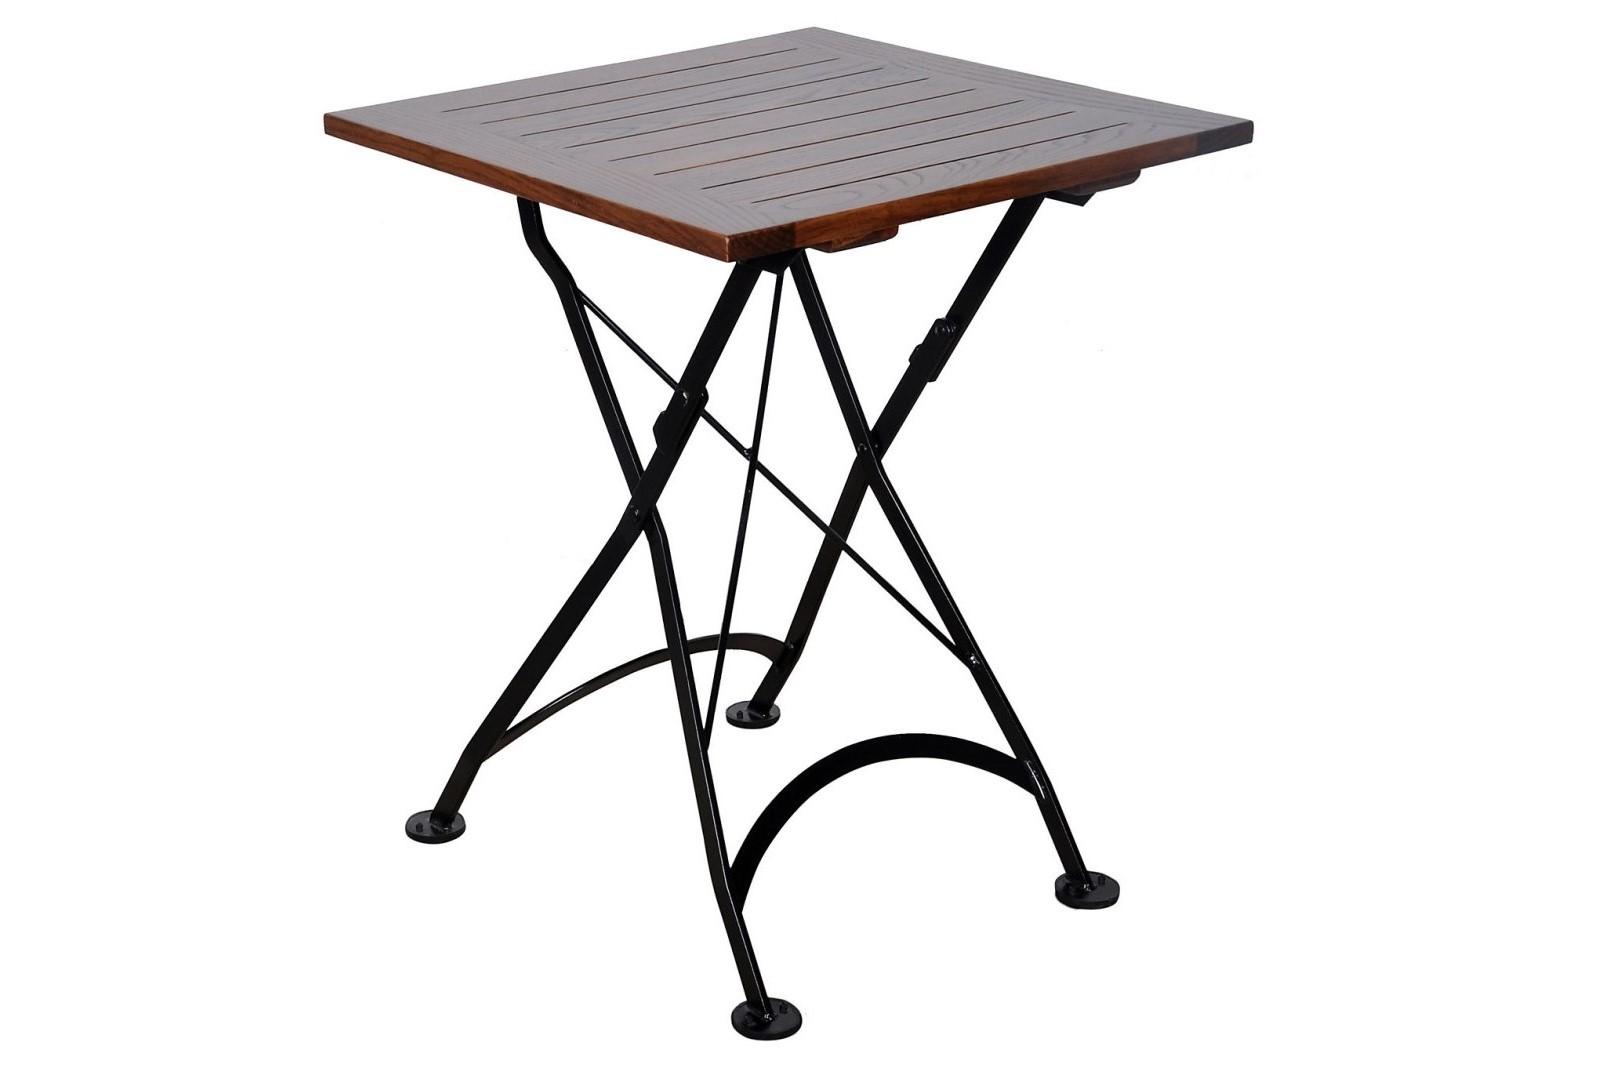 4113CW-BK European Chestnut dining table